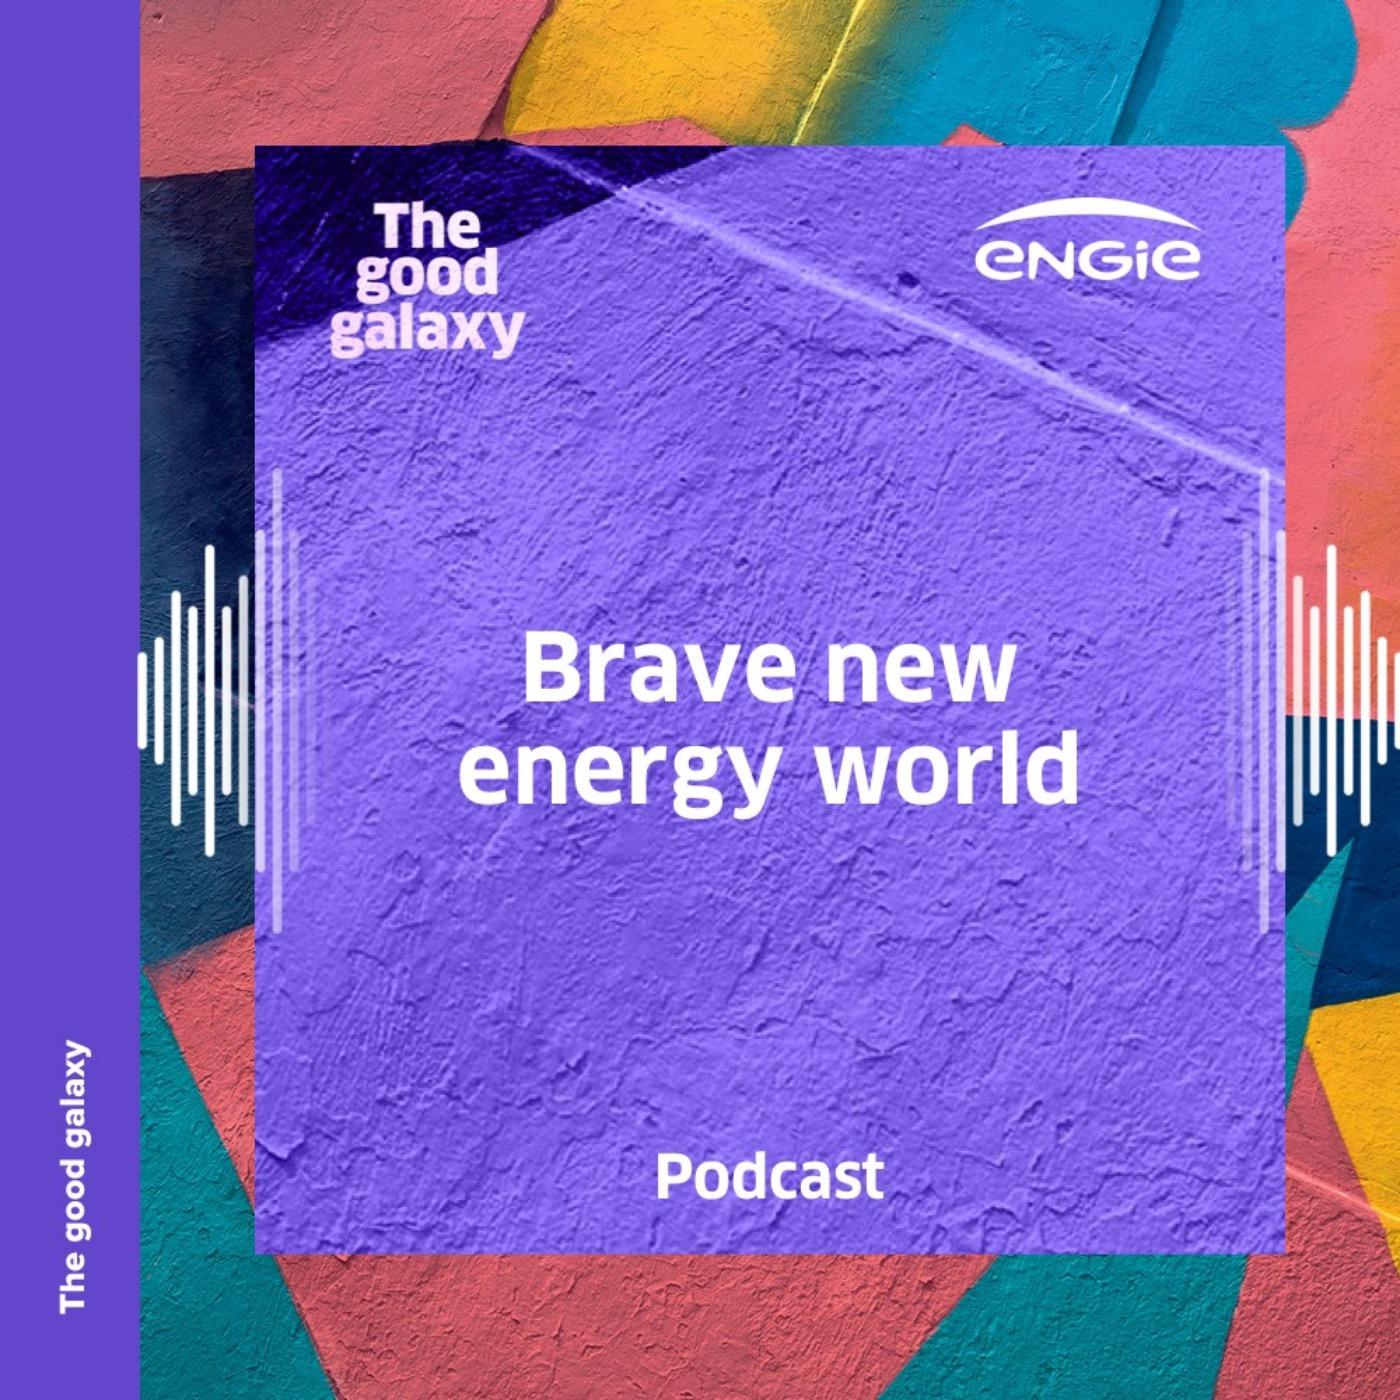 Brave new energy world